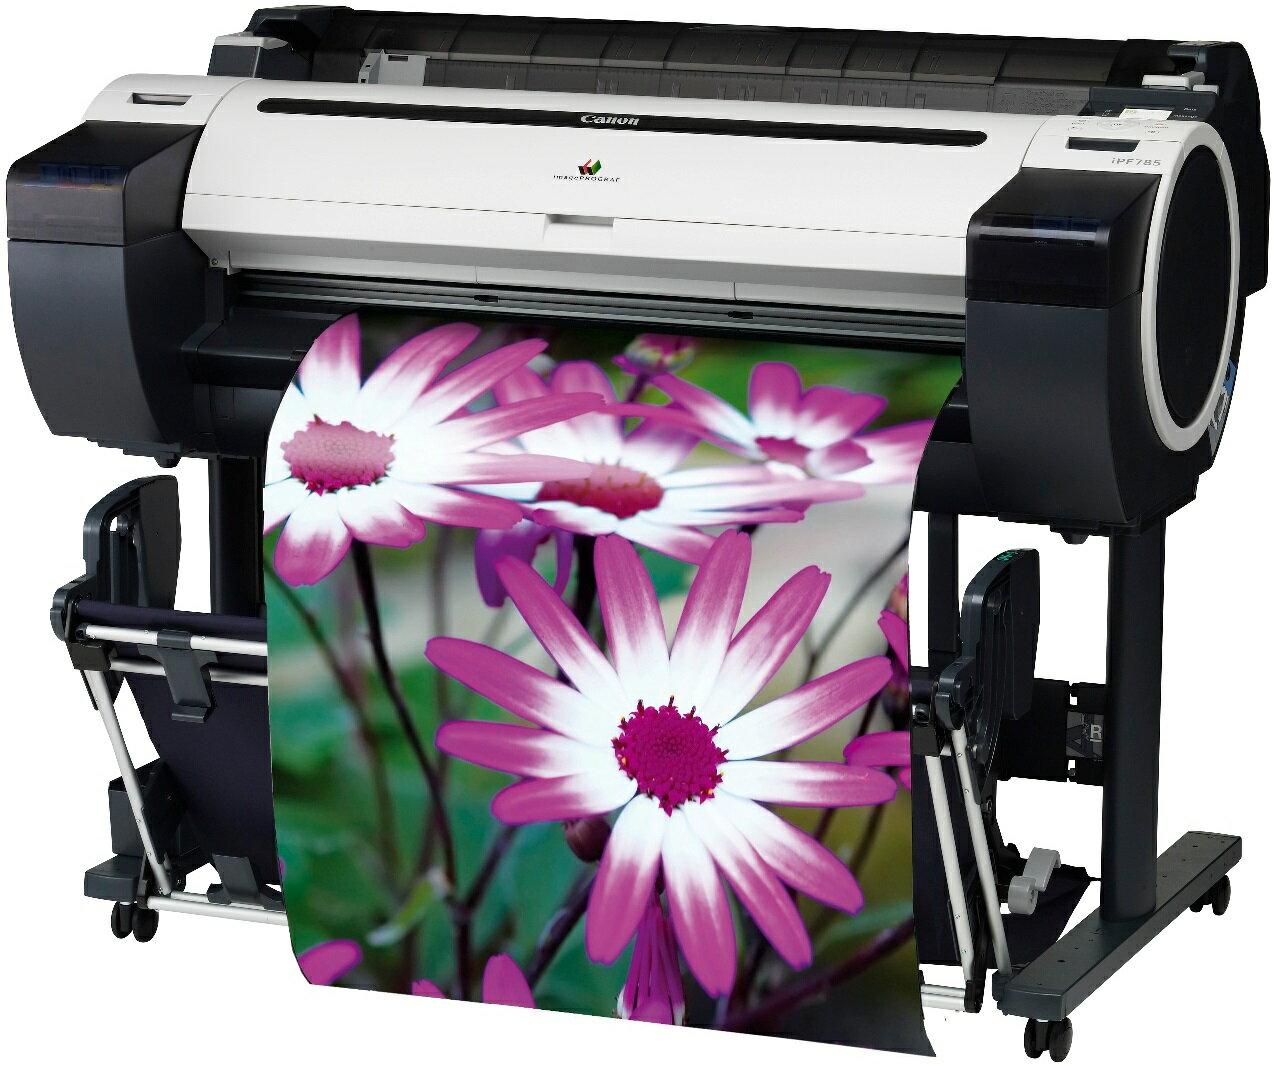 Canon imagePROGRAF iPF785 Printer Driver Windows